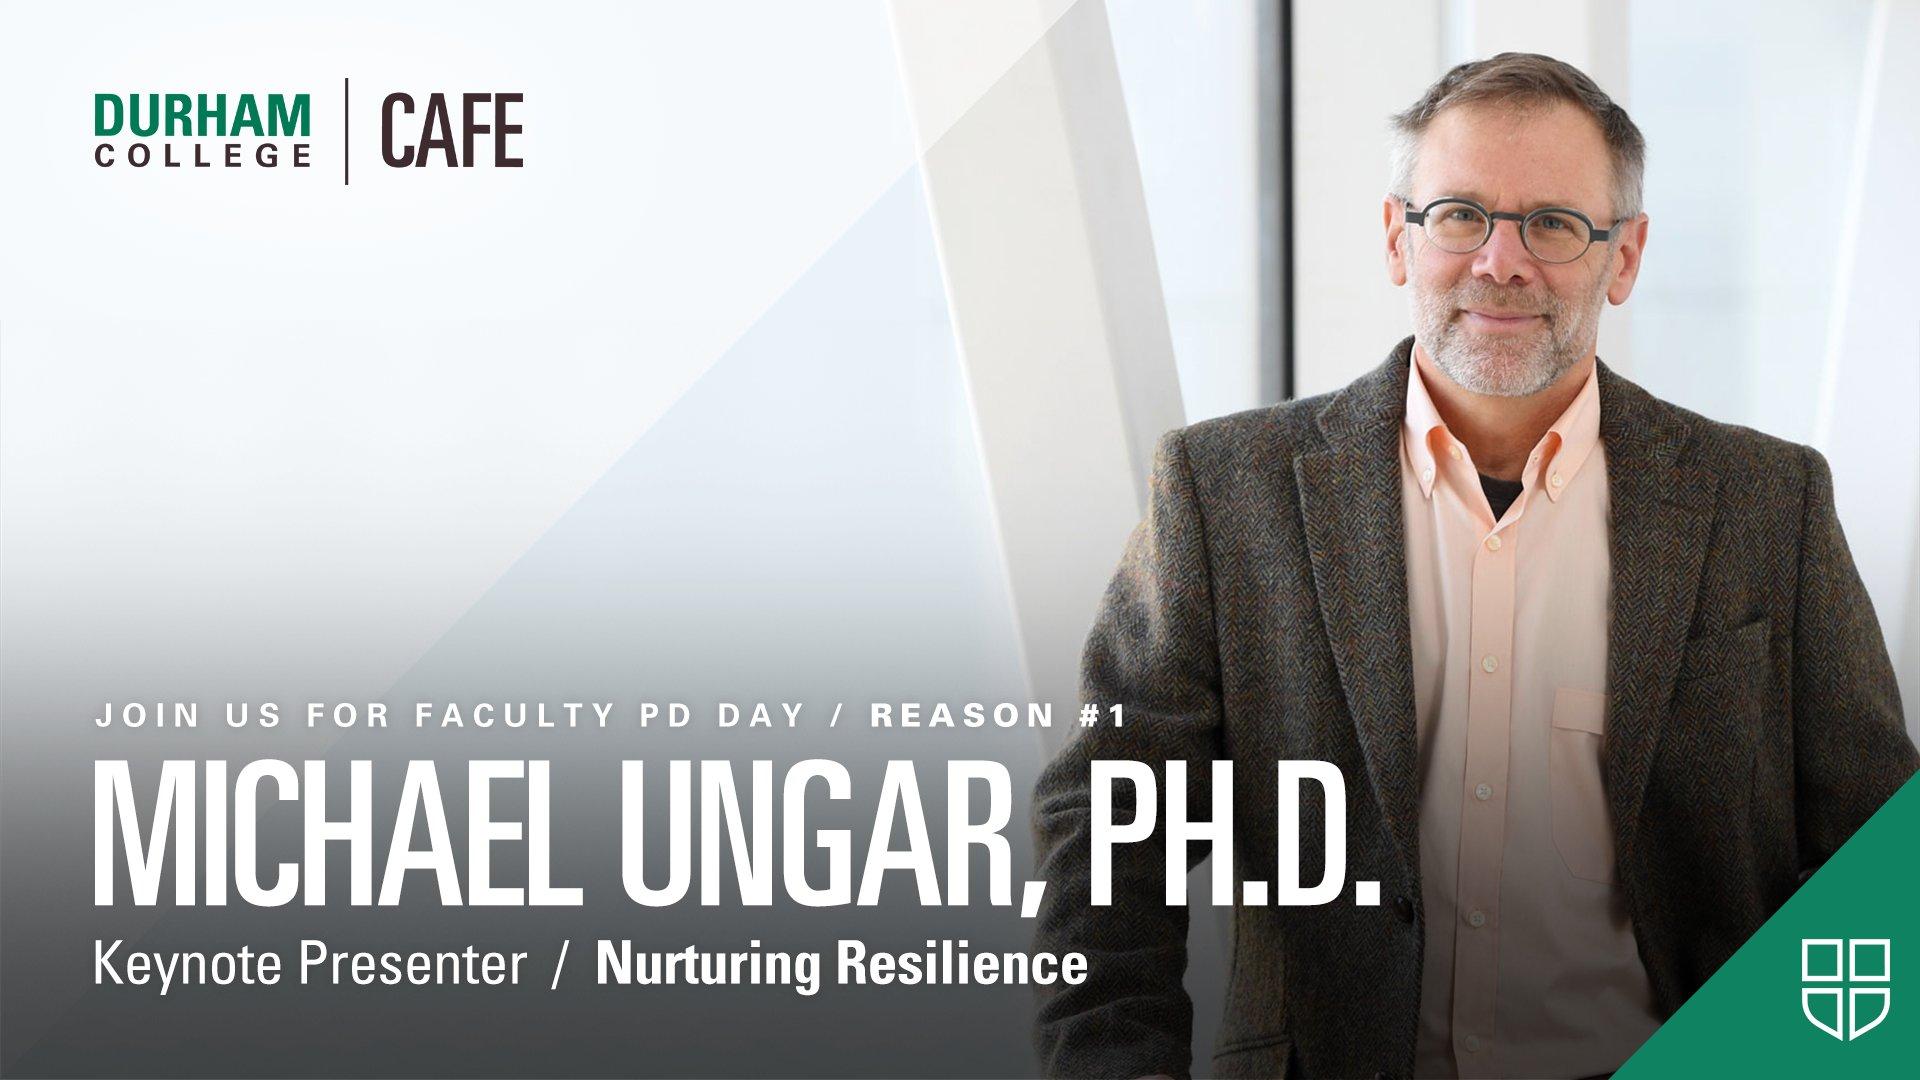 Michael Ungar, Ph.D. - Keynote Presenter / Nurturing Resilience